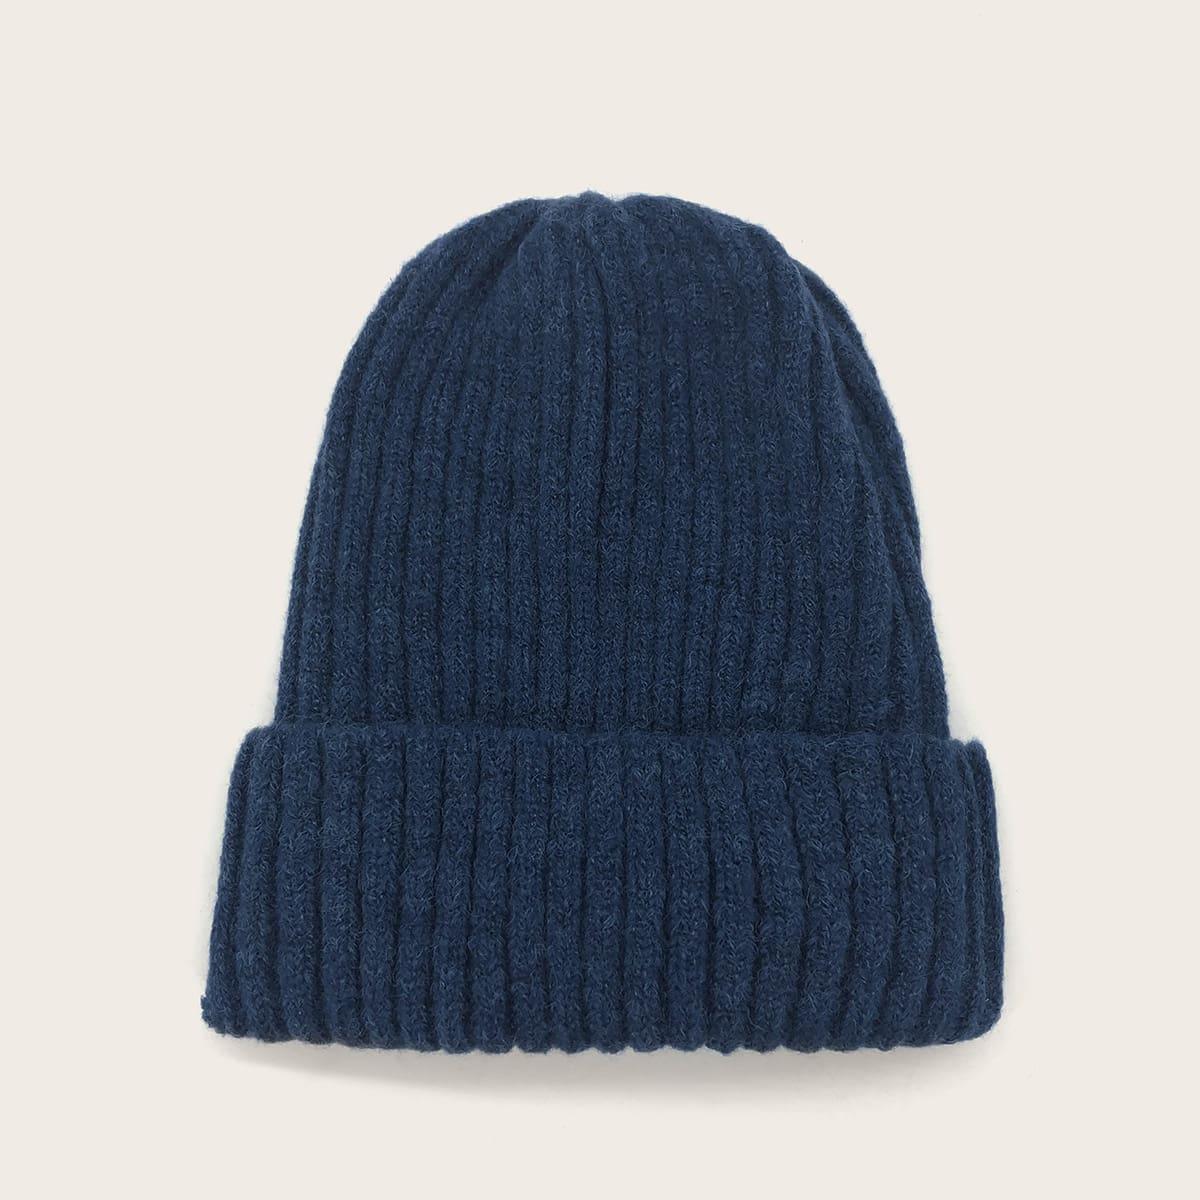 Мужская вязаная шапка от SHEIN